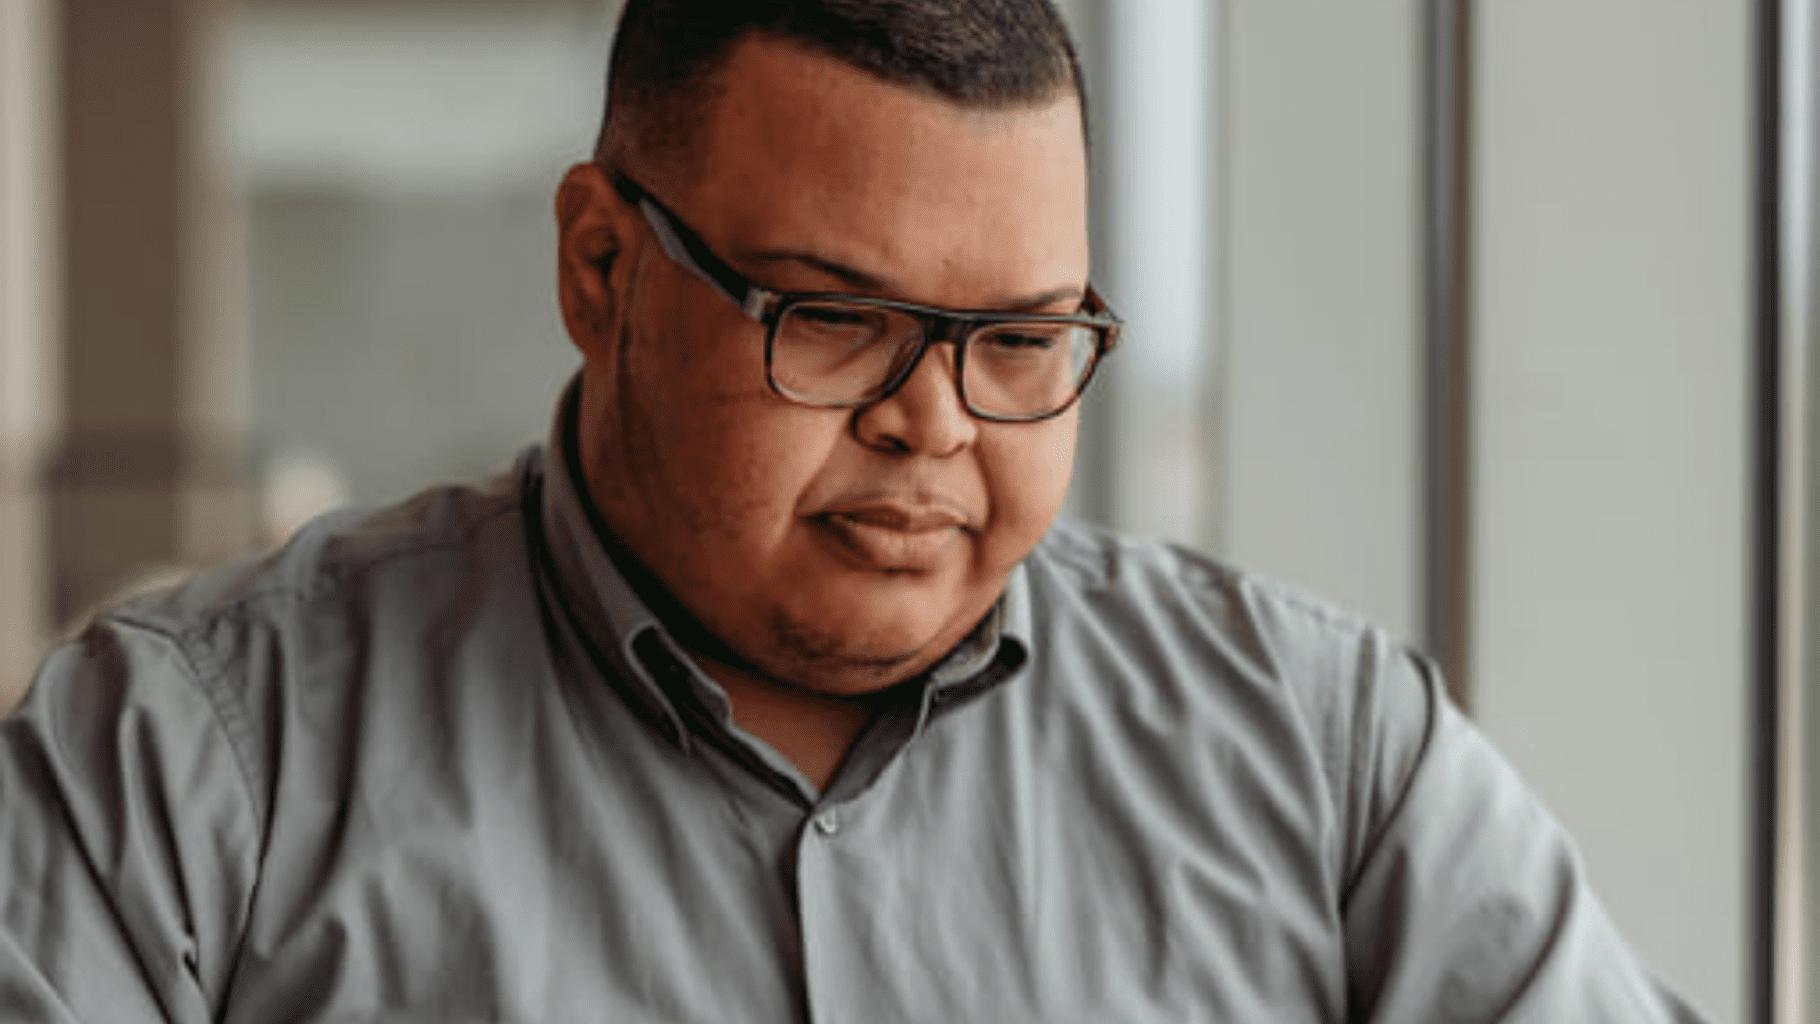 Cristian Soto Garcia: Pone tur carta riba mesa